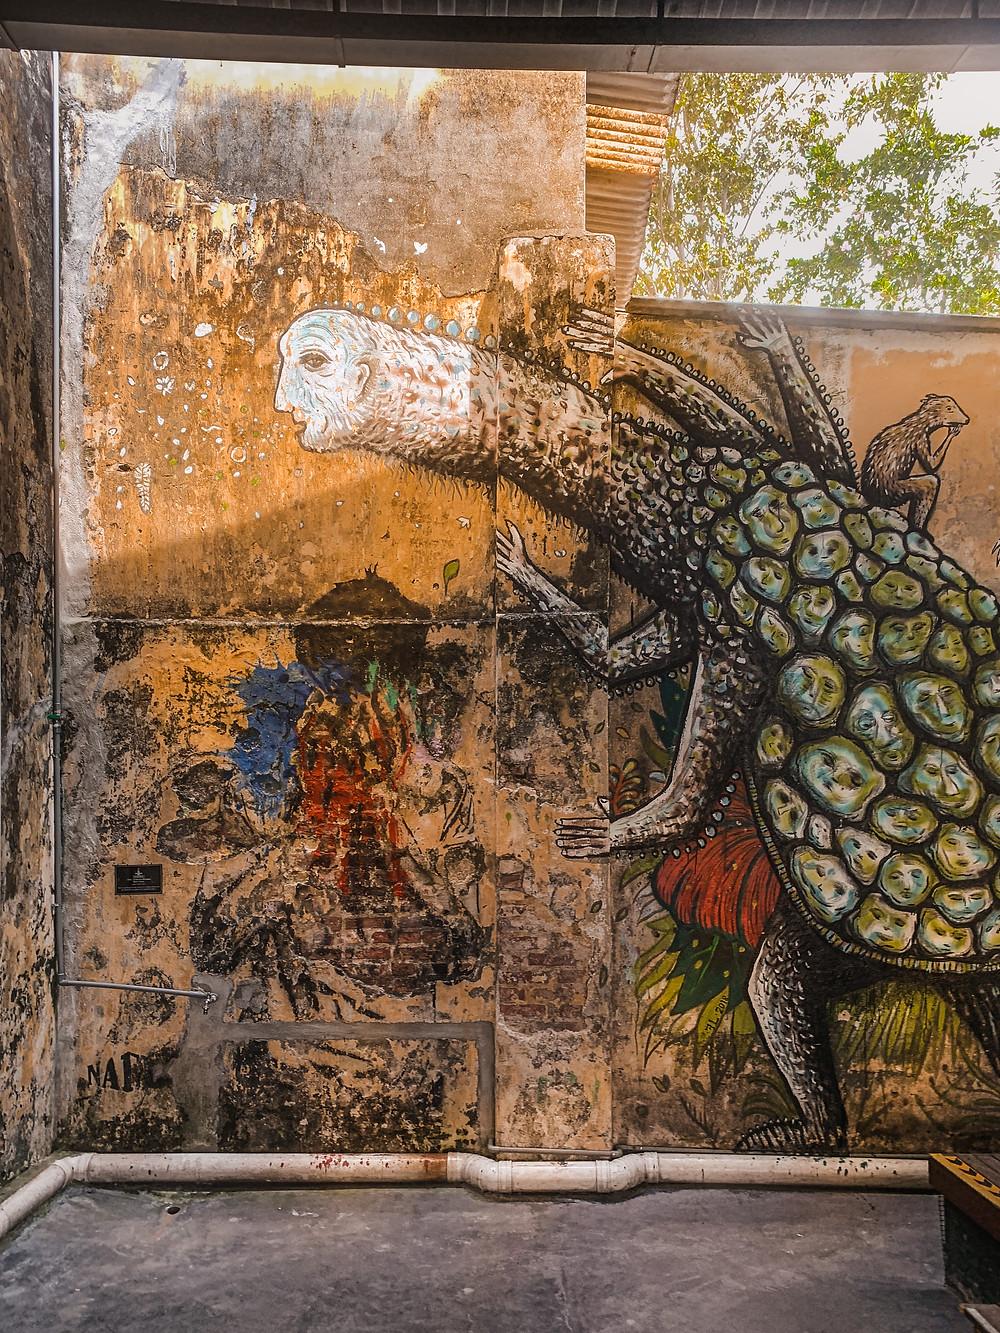 Fantasy art mural against orange wall of Hin Bus Depot, Penang, RollingBear Travels blog.